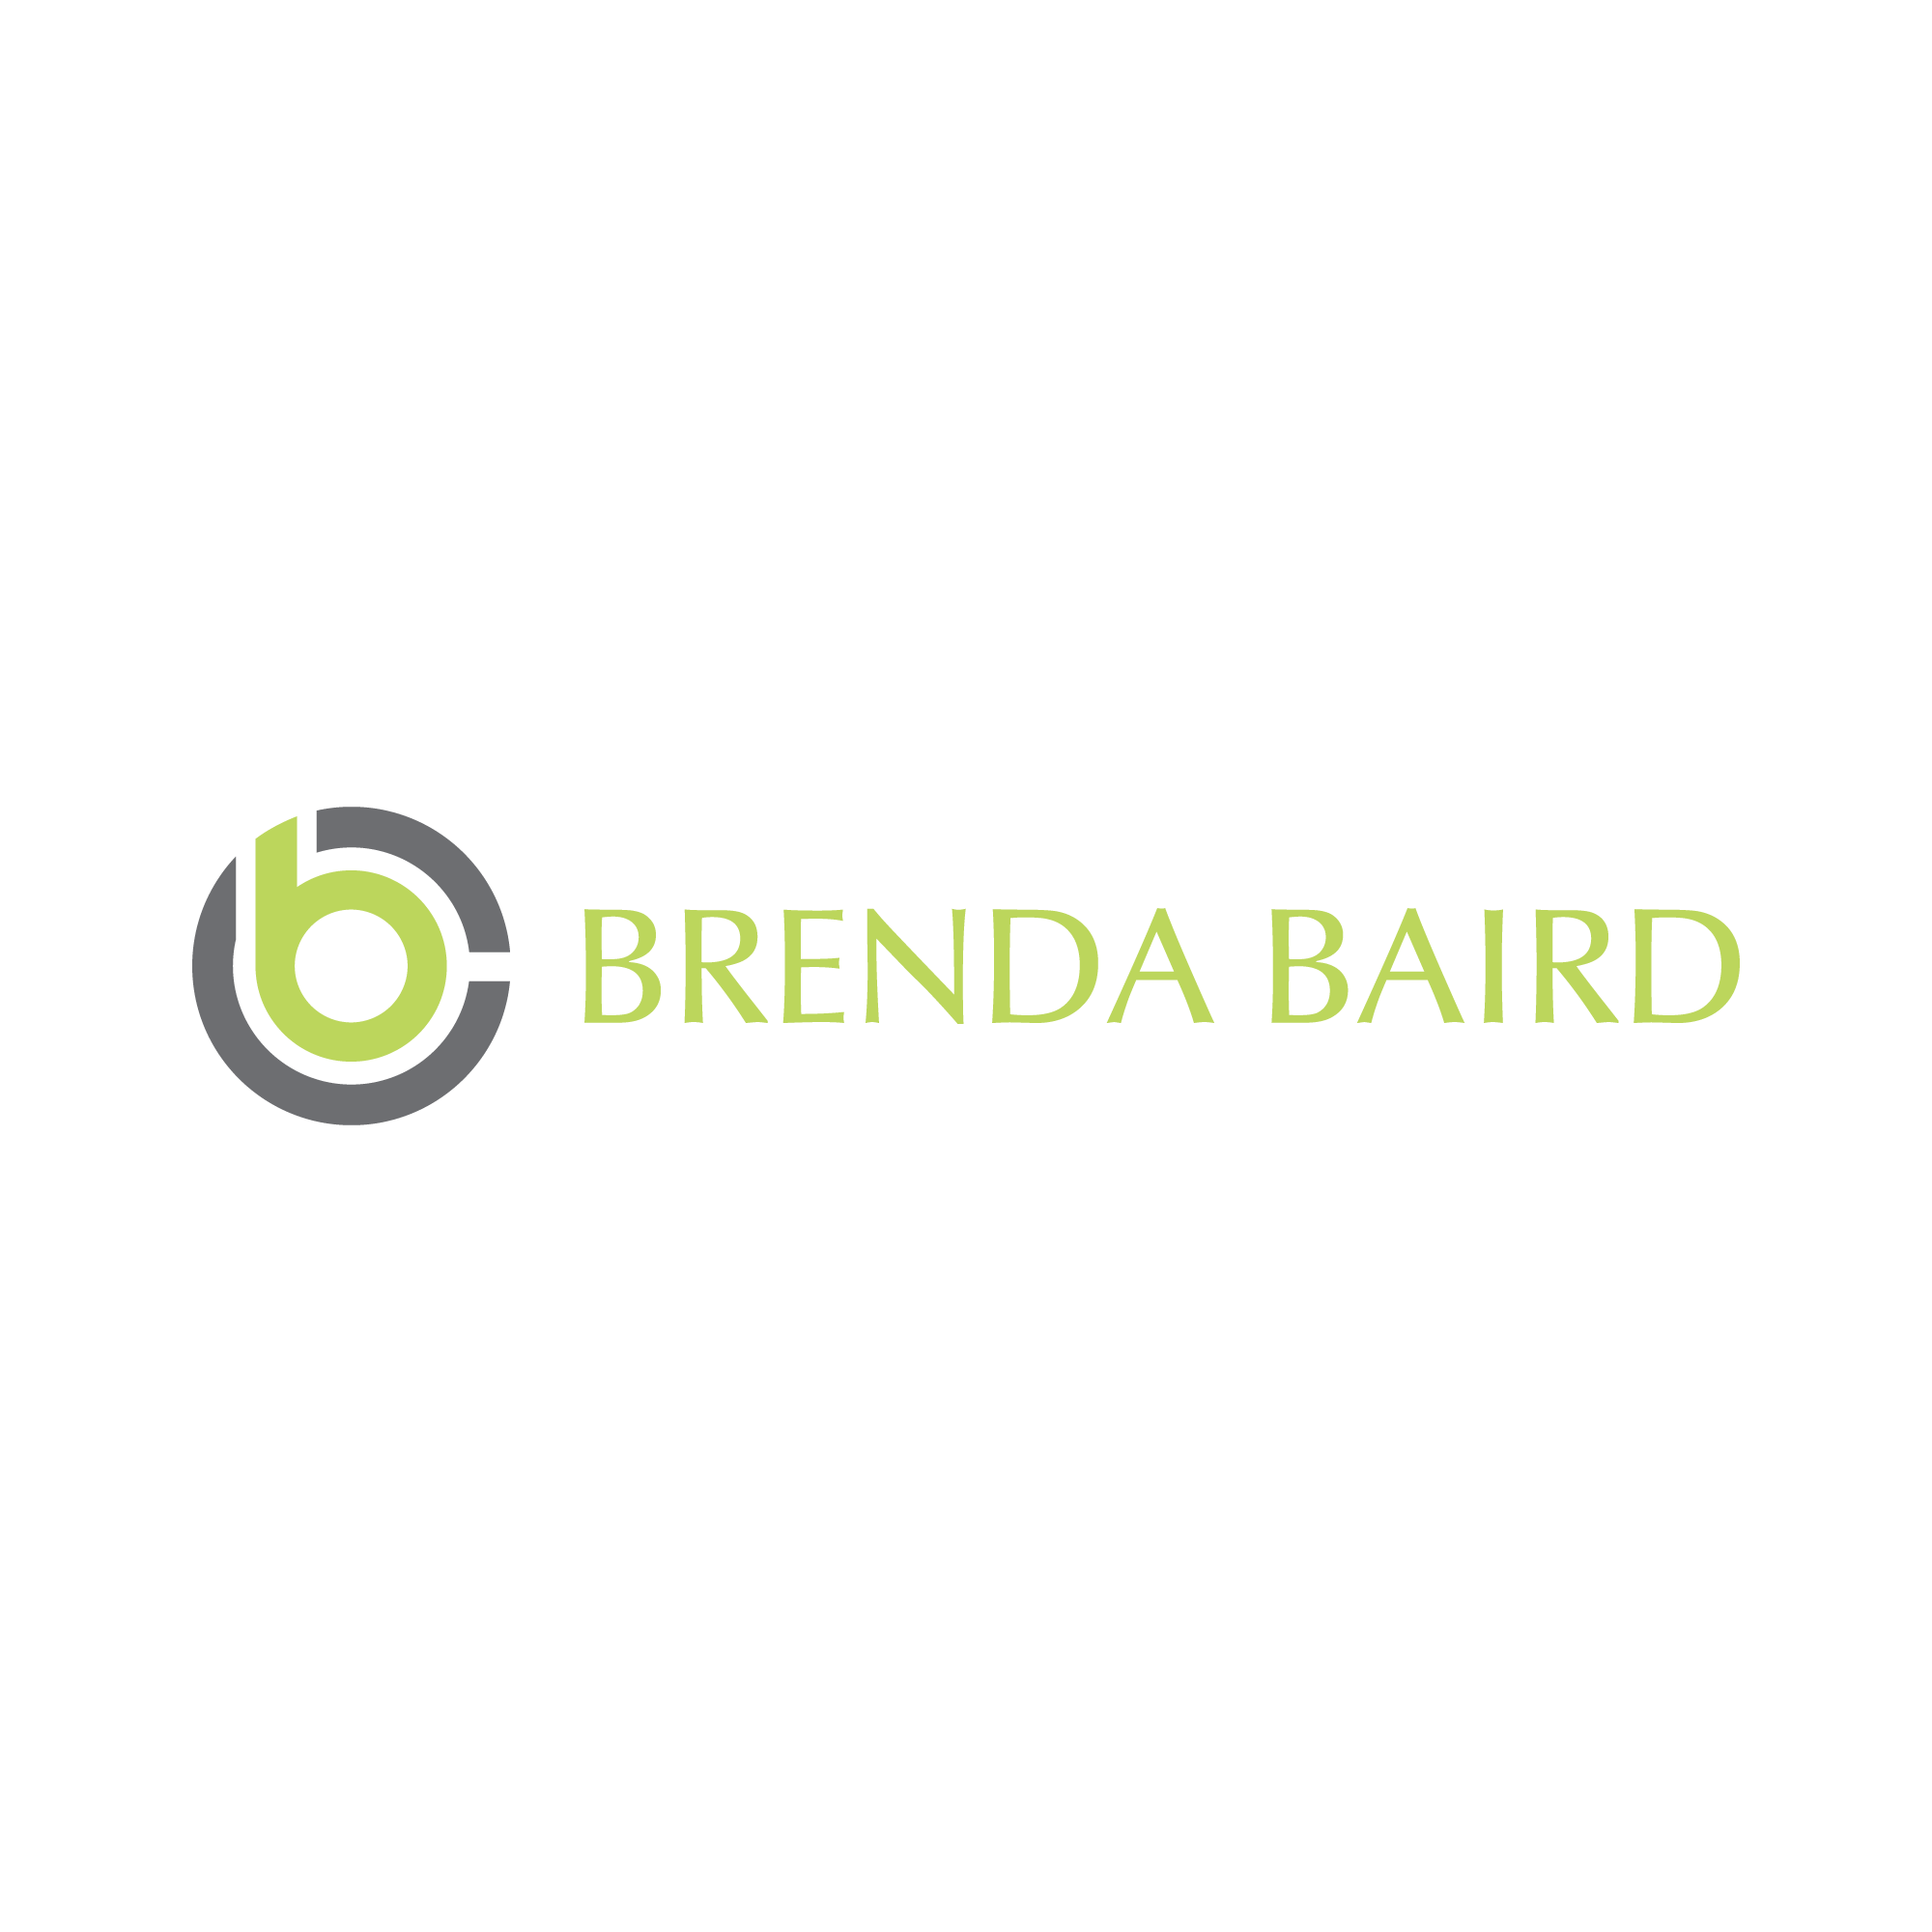 Meeting with Brenda Baird